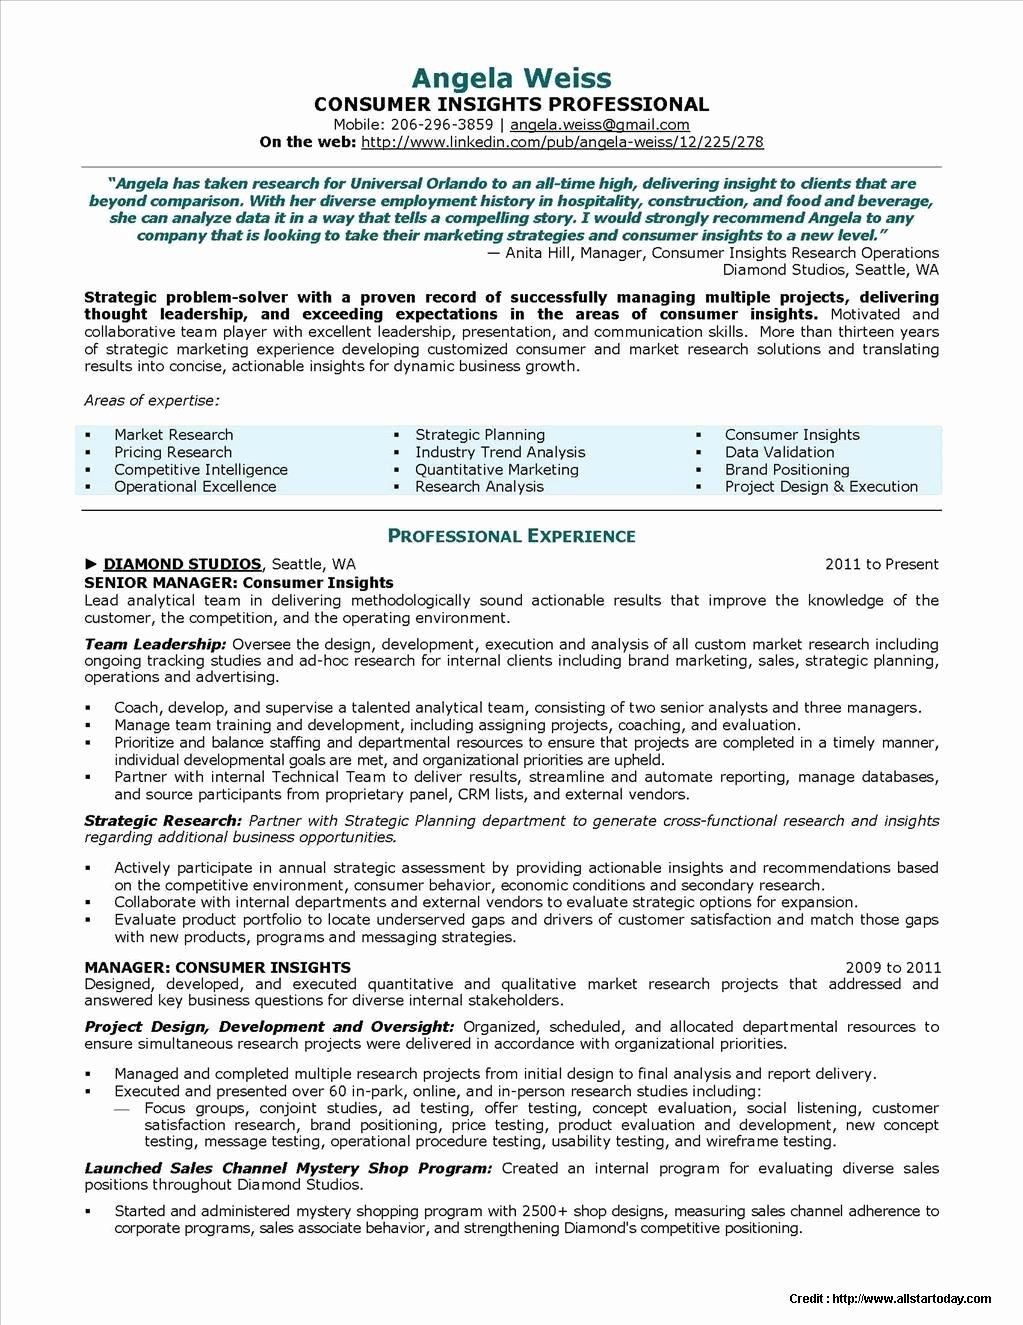 Professional Resume Writing Service Chicago Resume